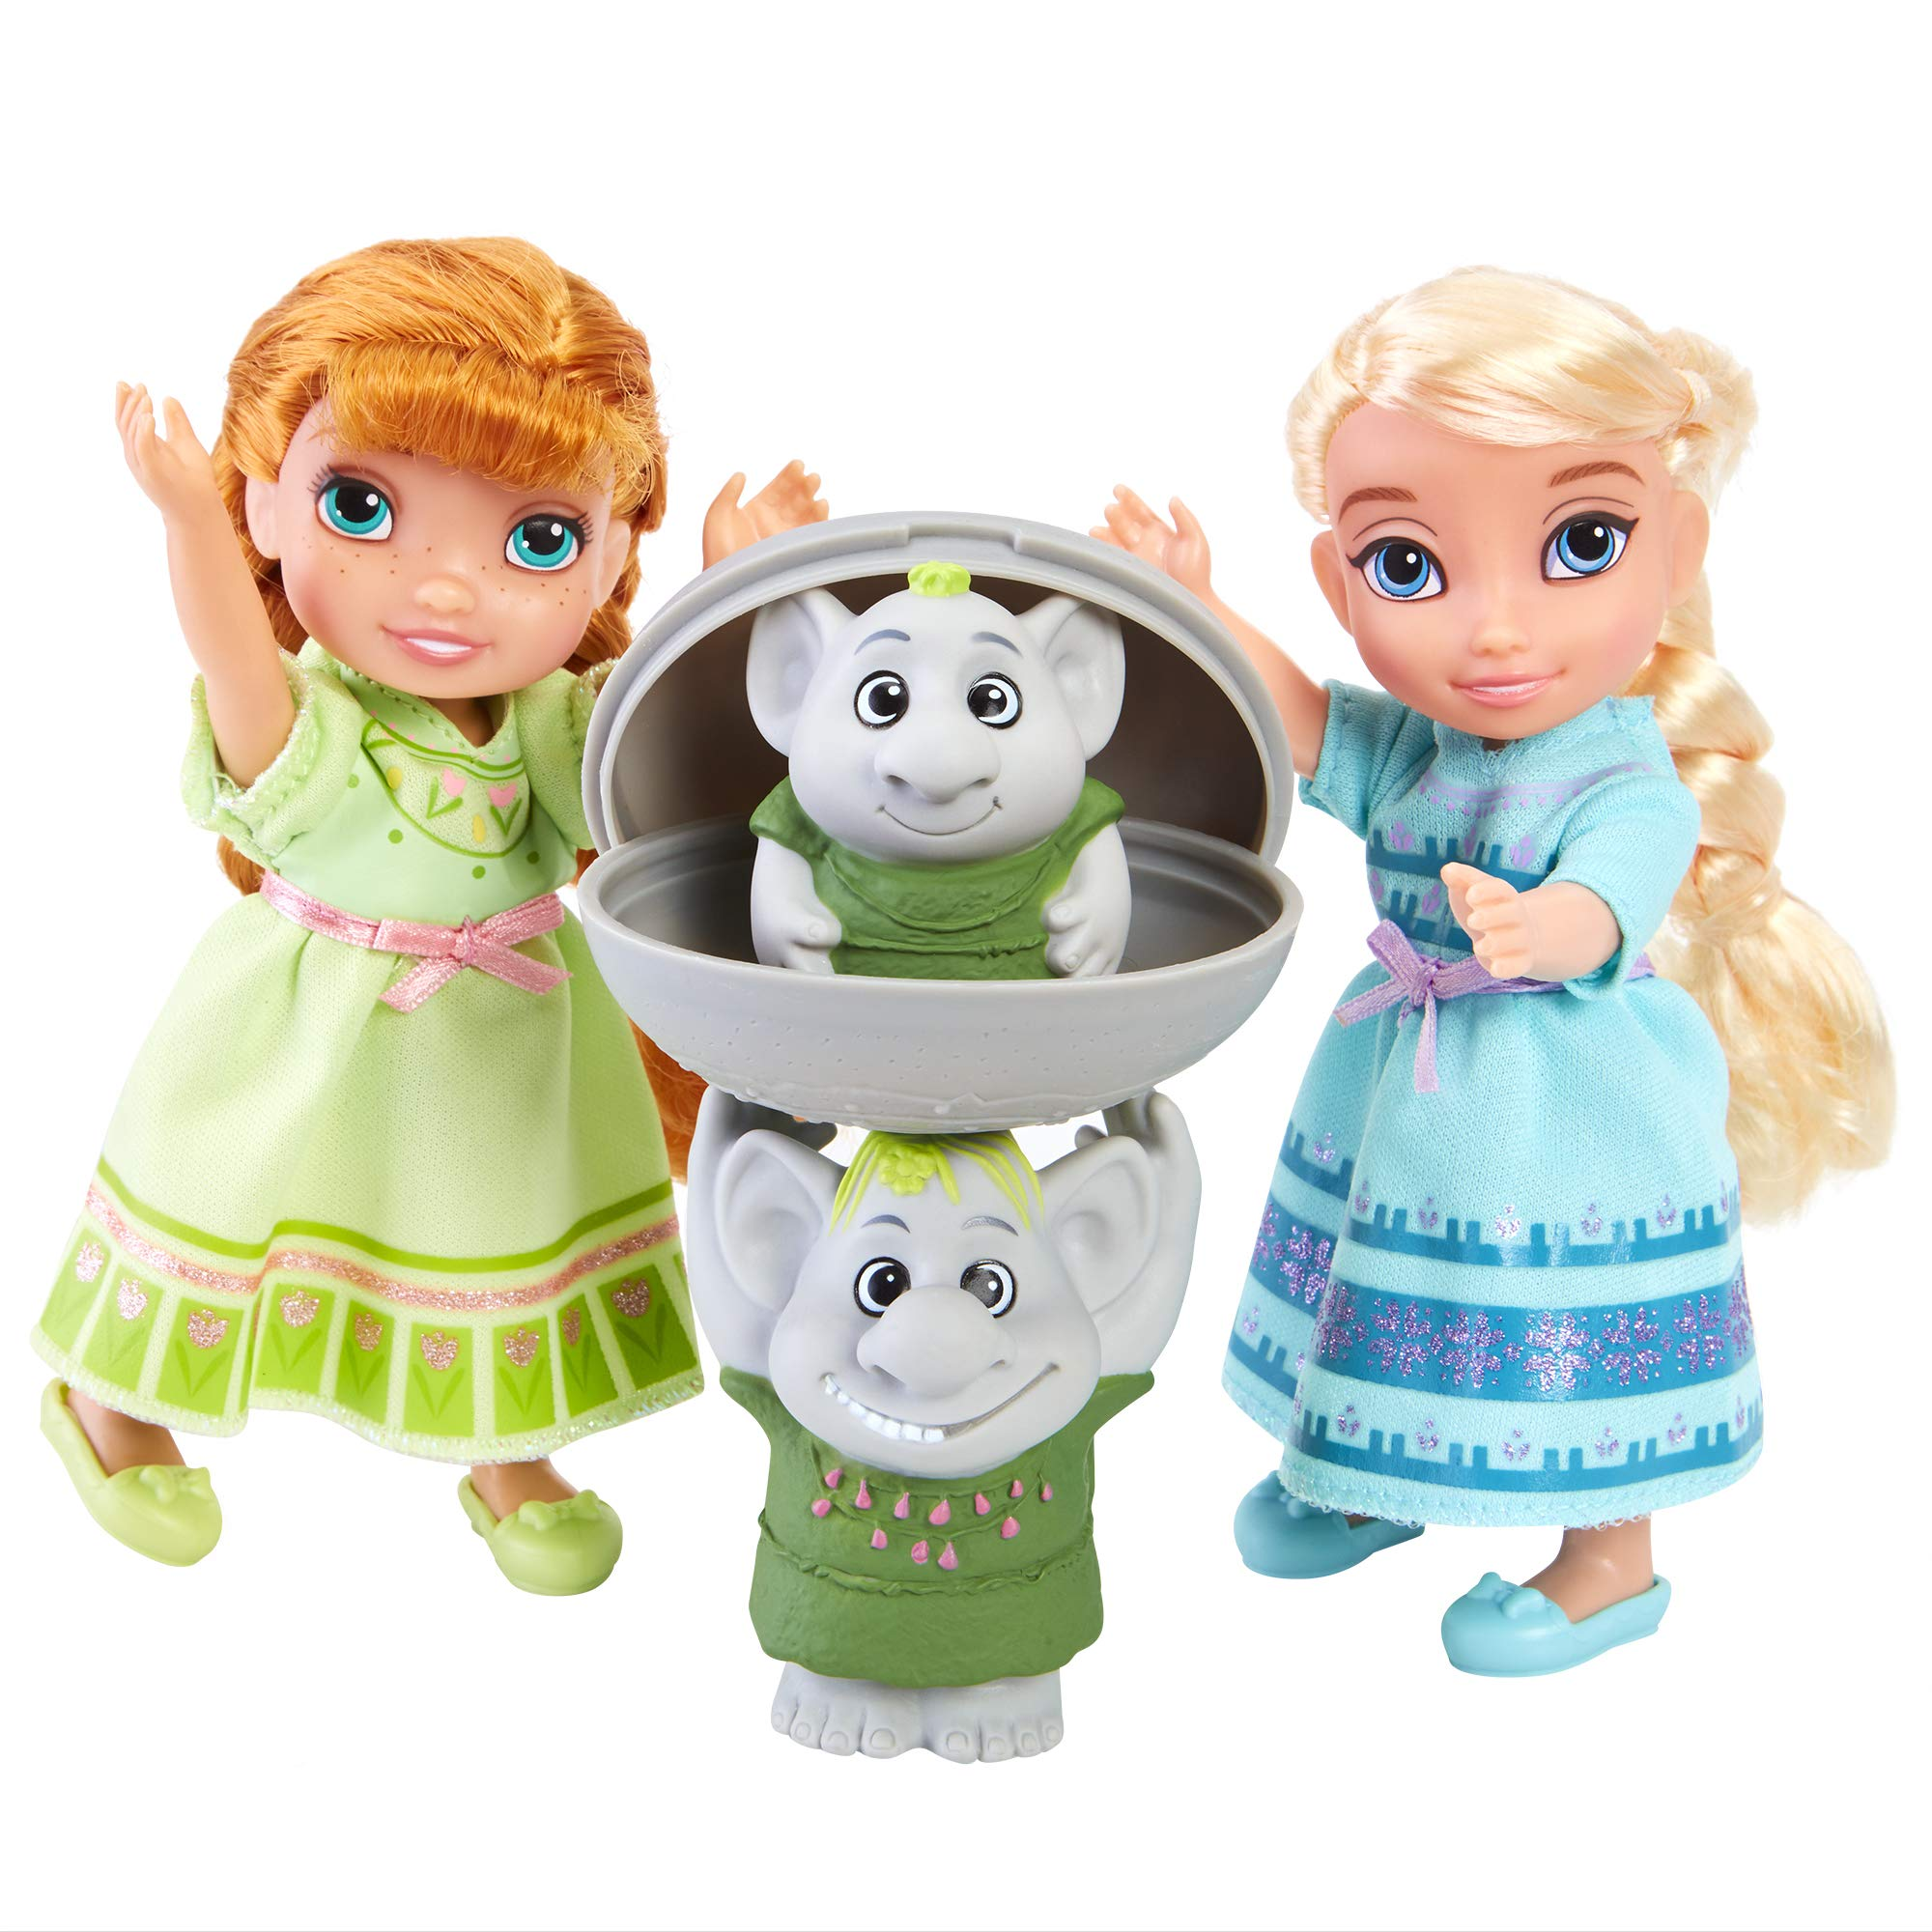 Disney Frozen Petite Surprise Trolls Gift Set